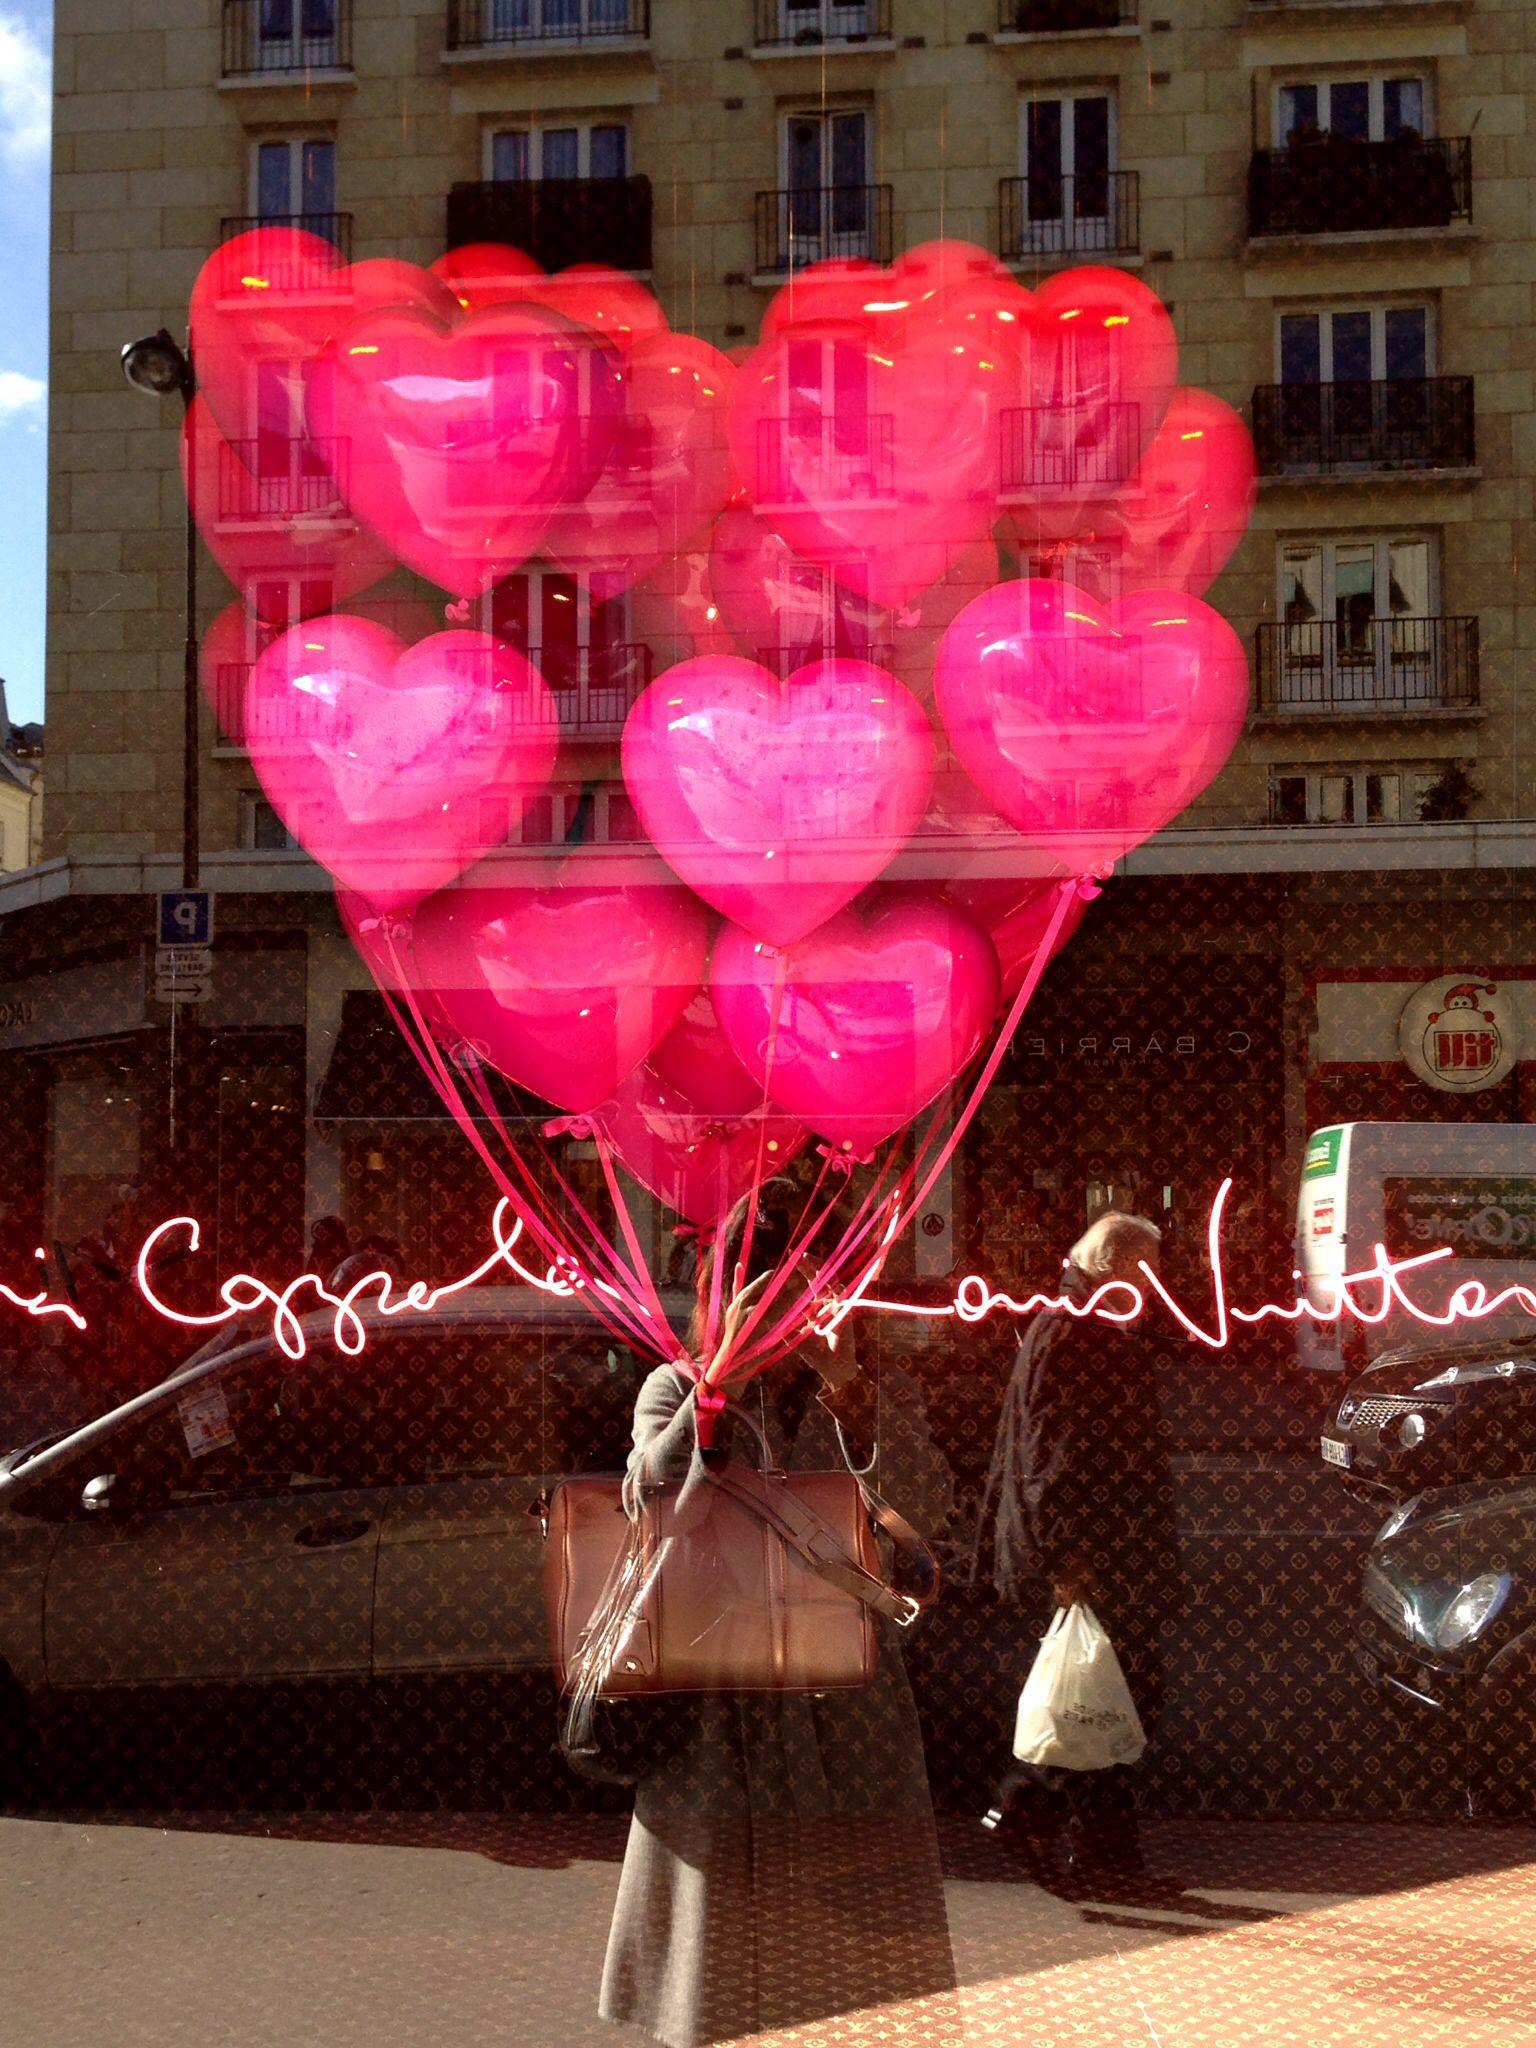 Sofia Coppola for Louis Vuitton At Bon Marche oktober 2013